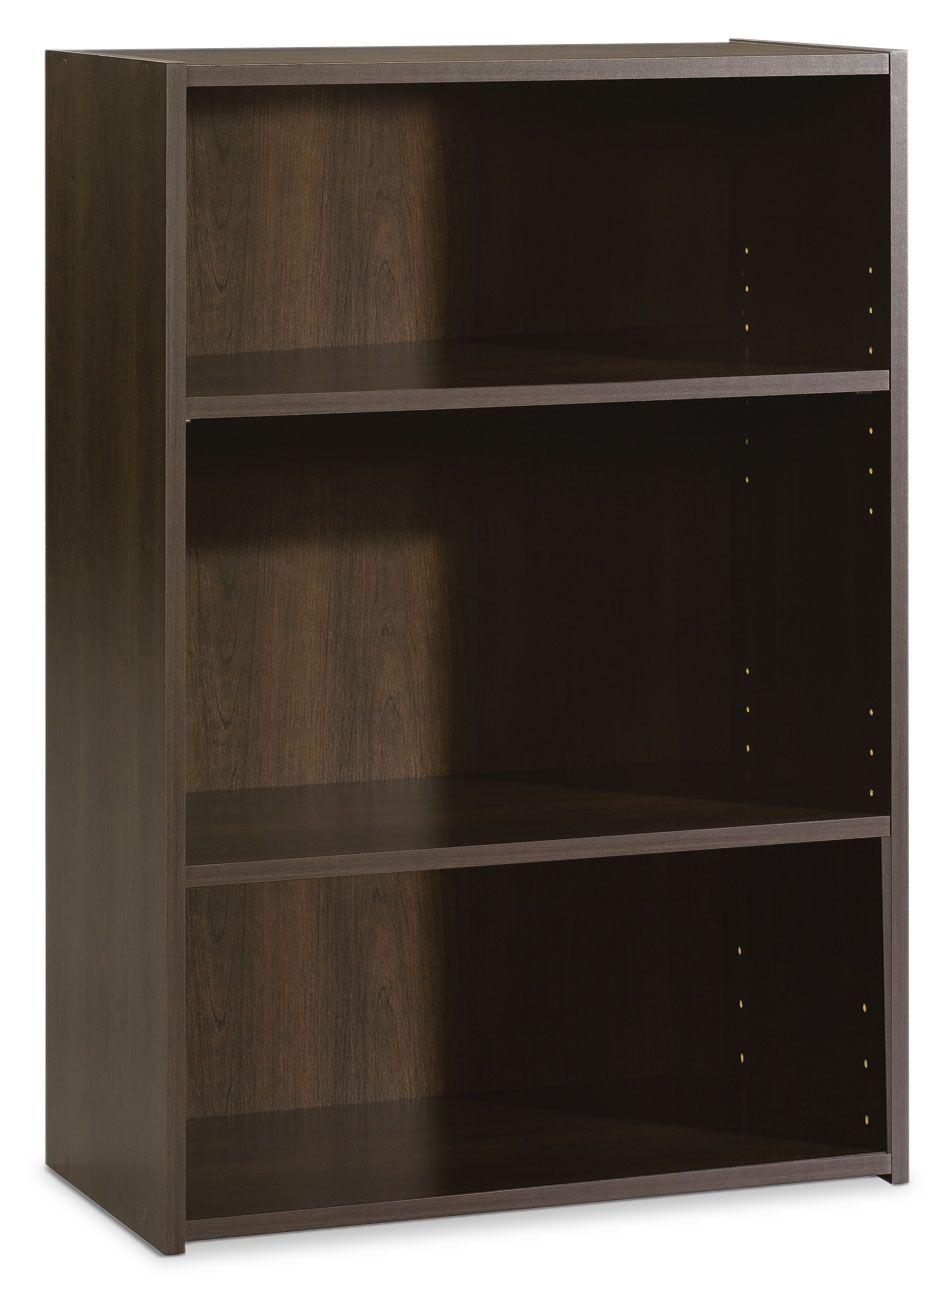 Home Office Furniture - Boston 3-Shelf Bookcase